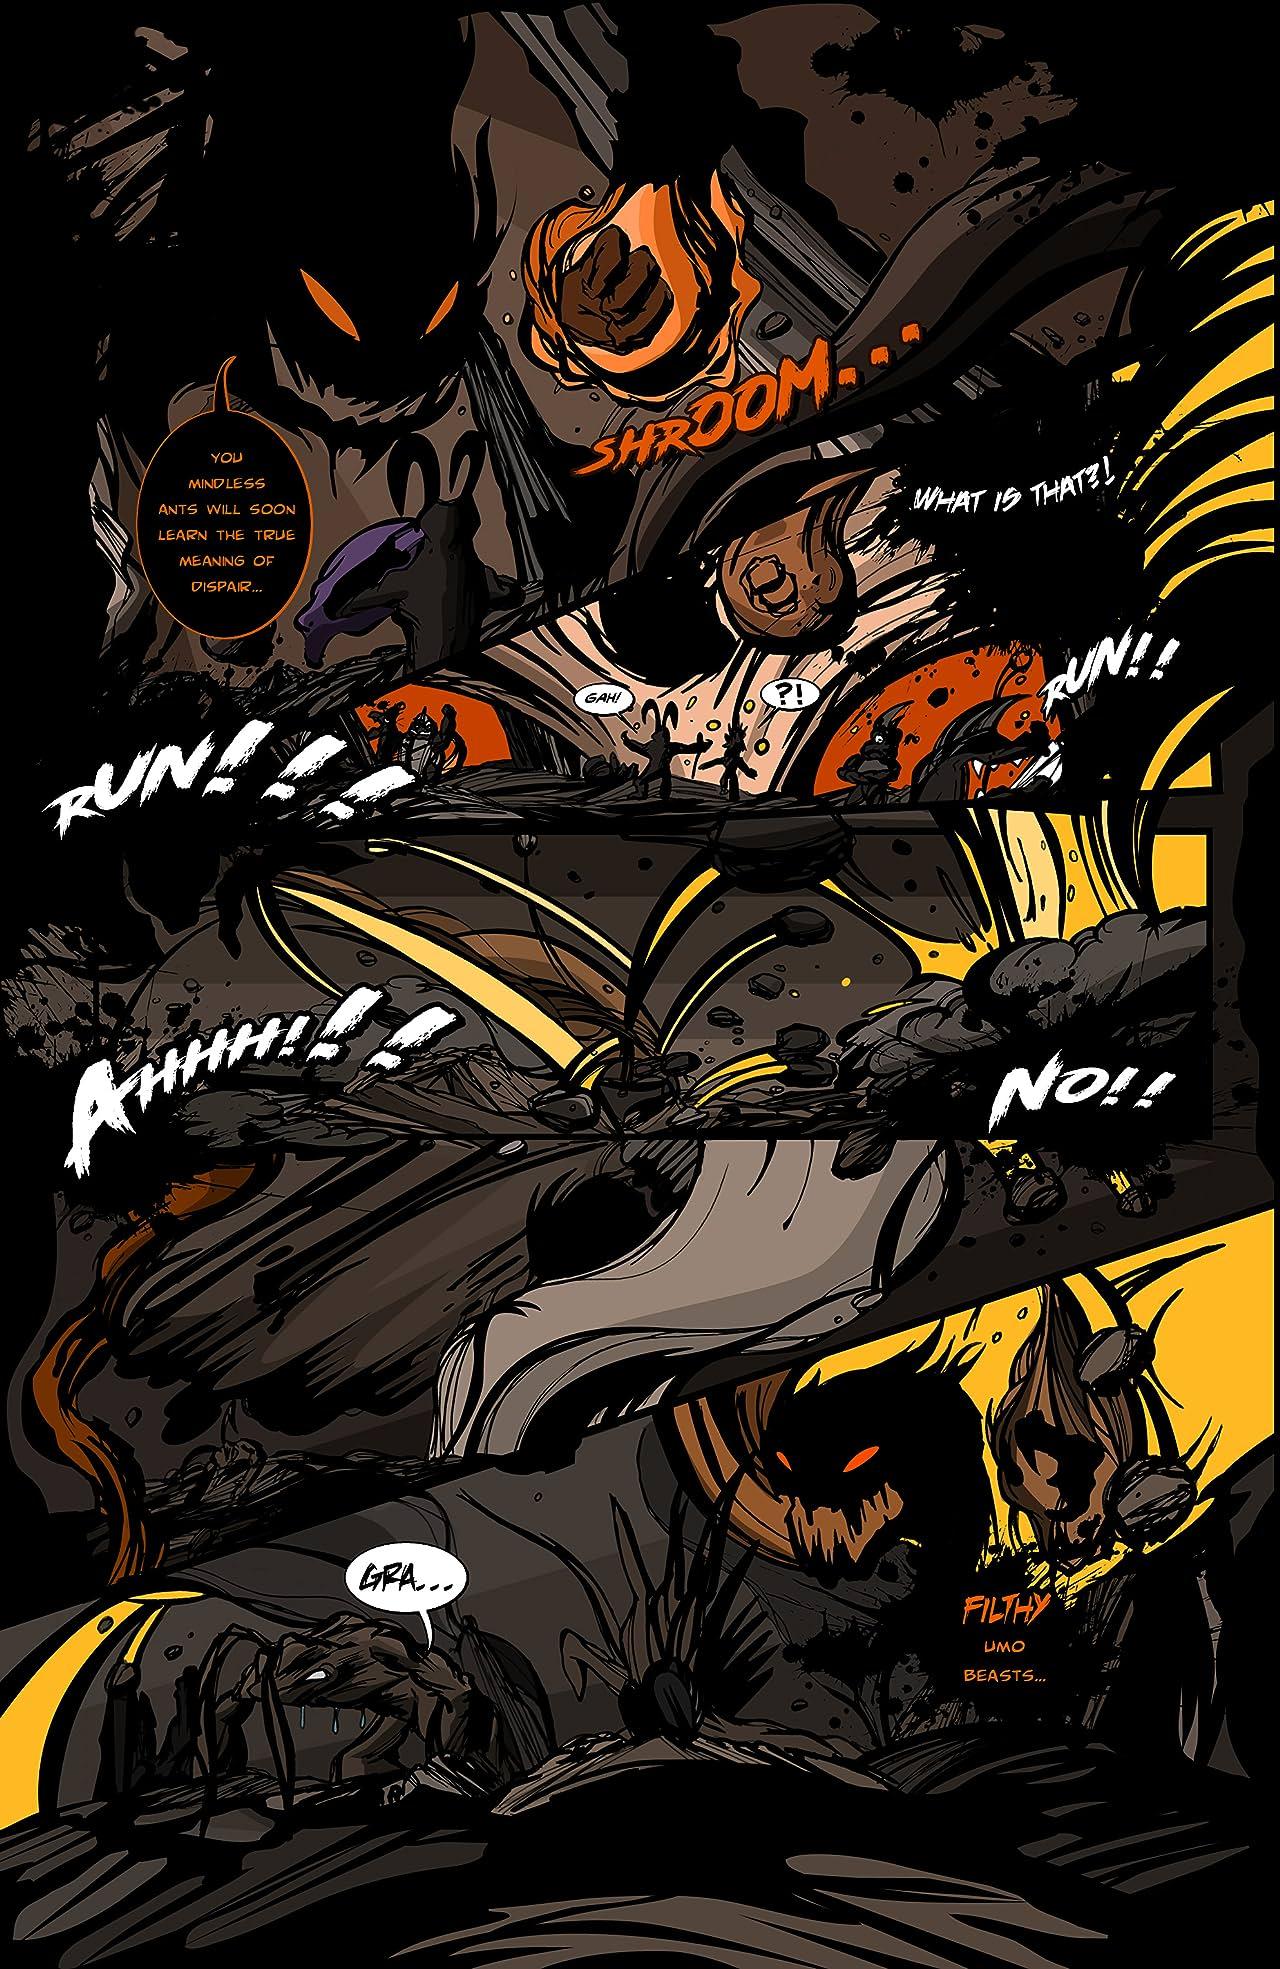 Umo Beast Chronicles #1